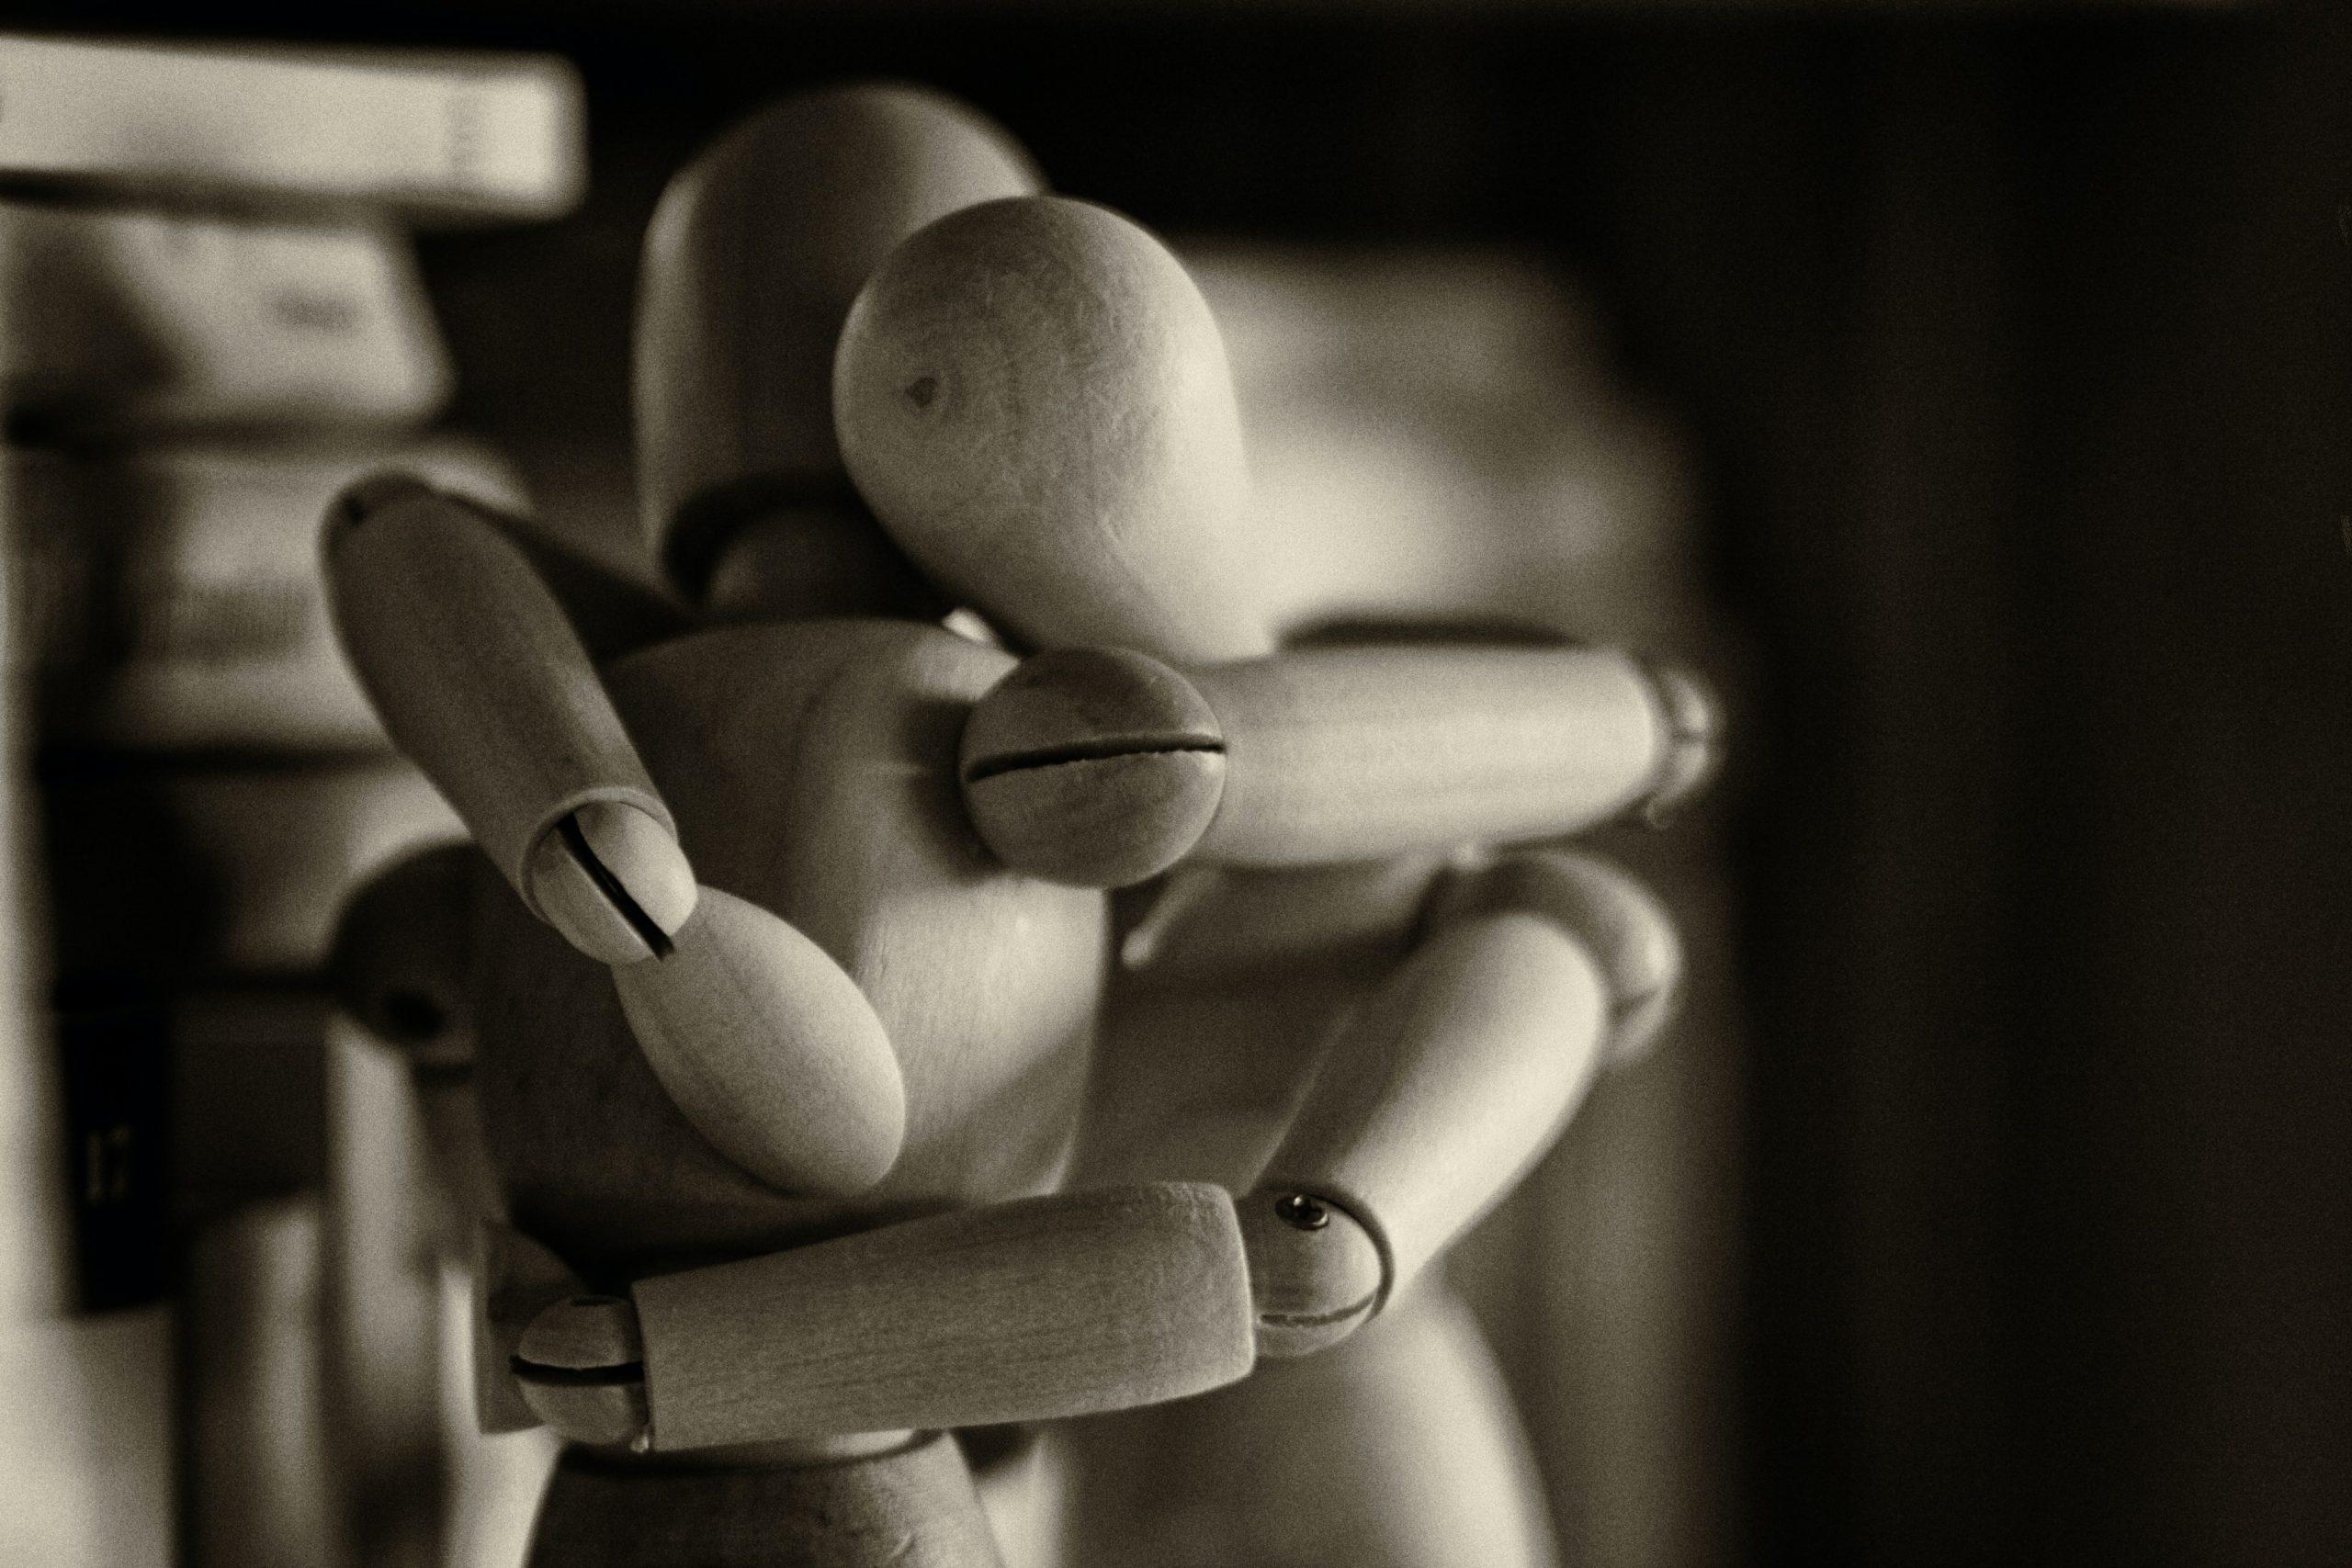 Two wooden dummy figures hugging